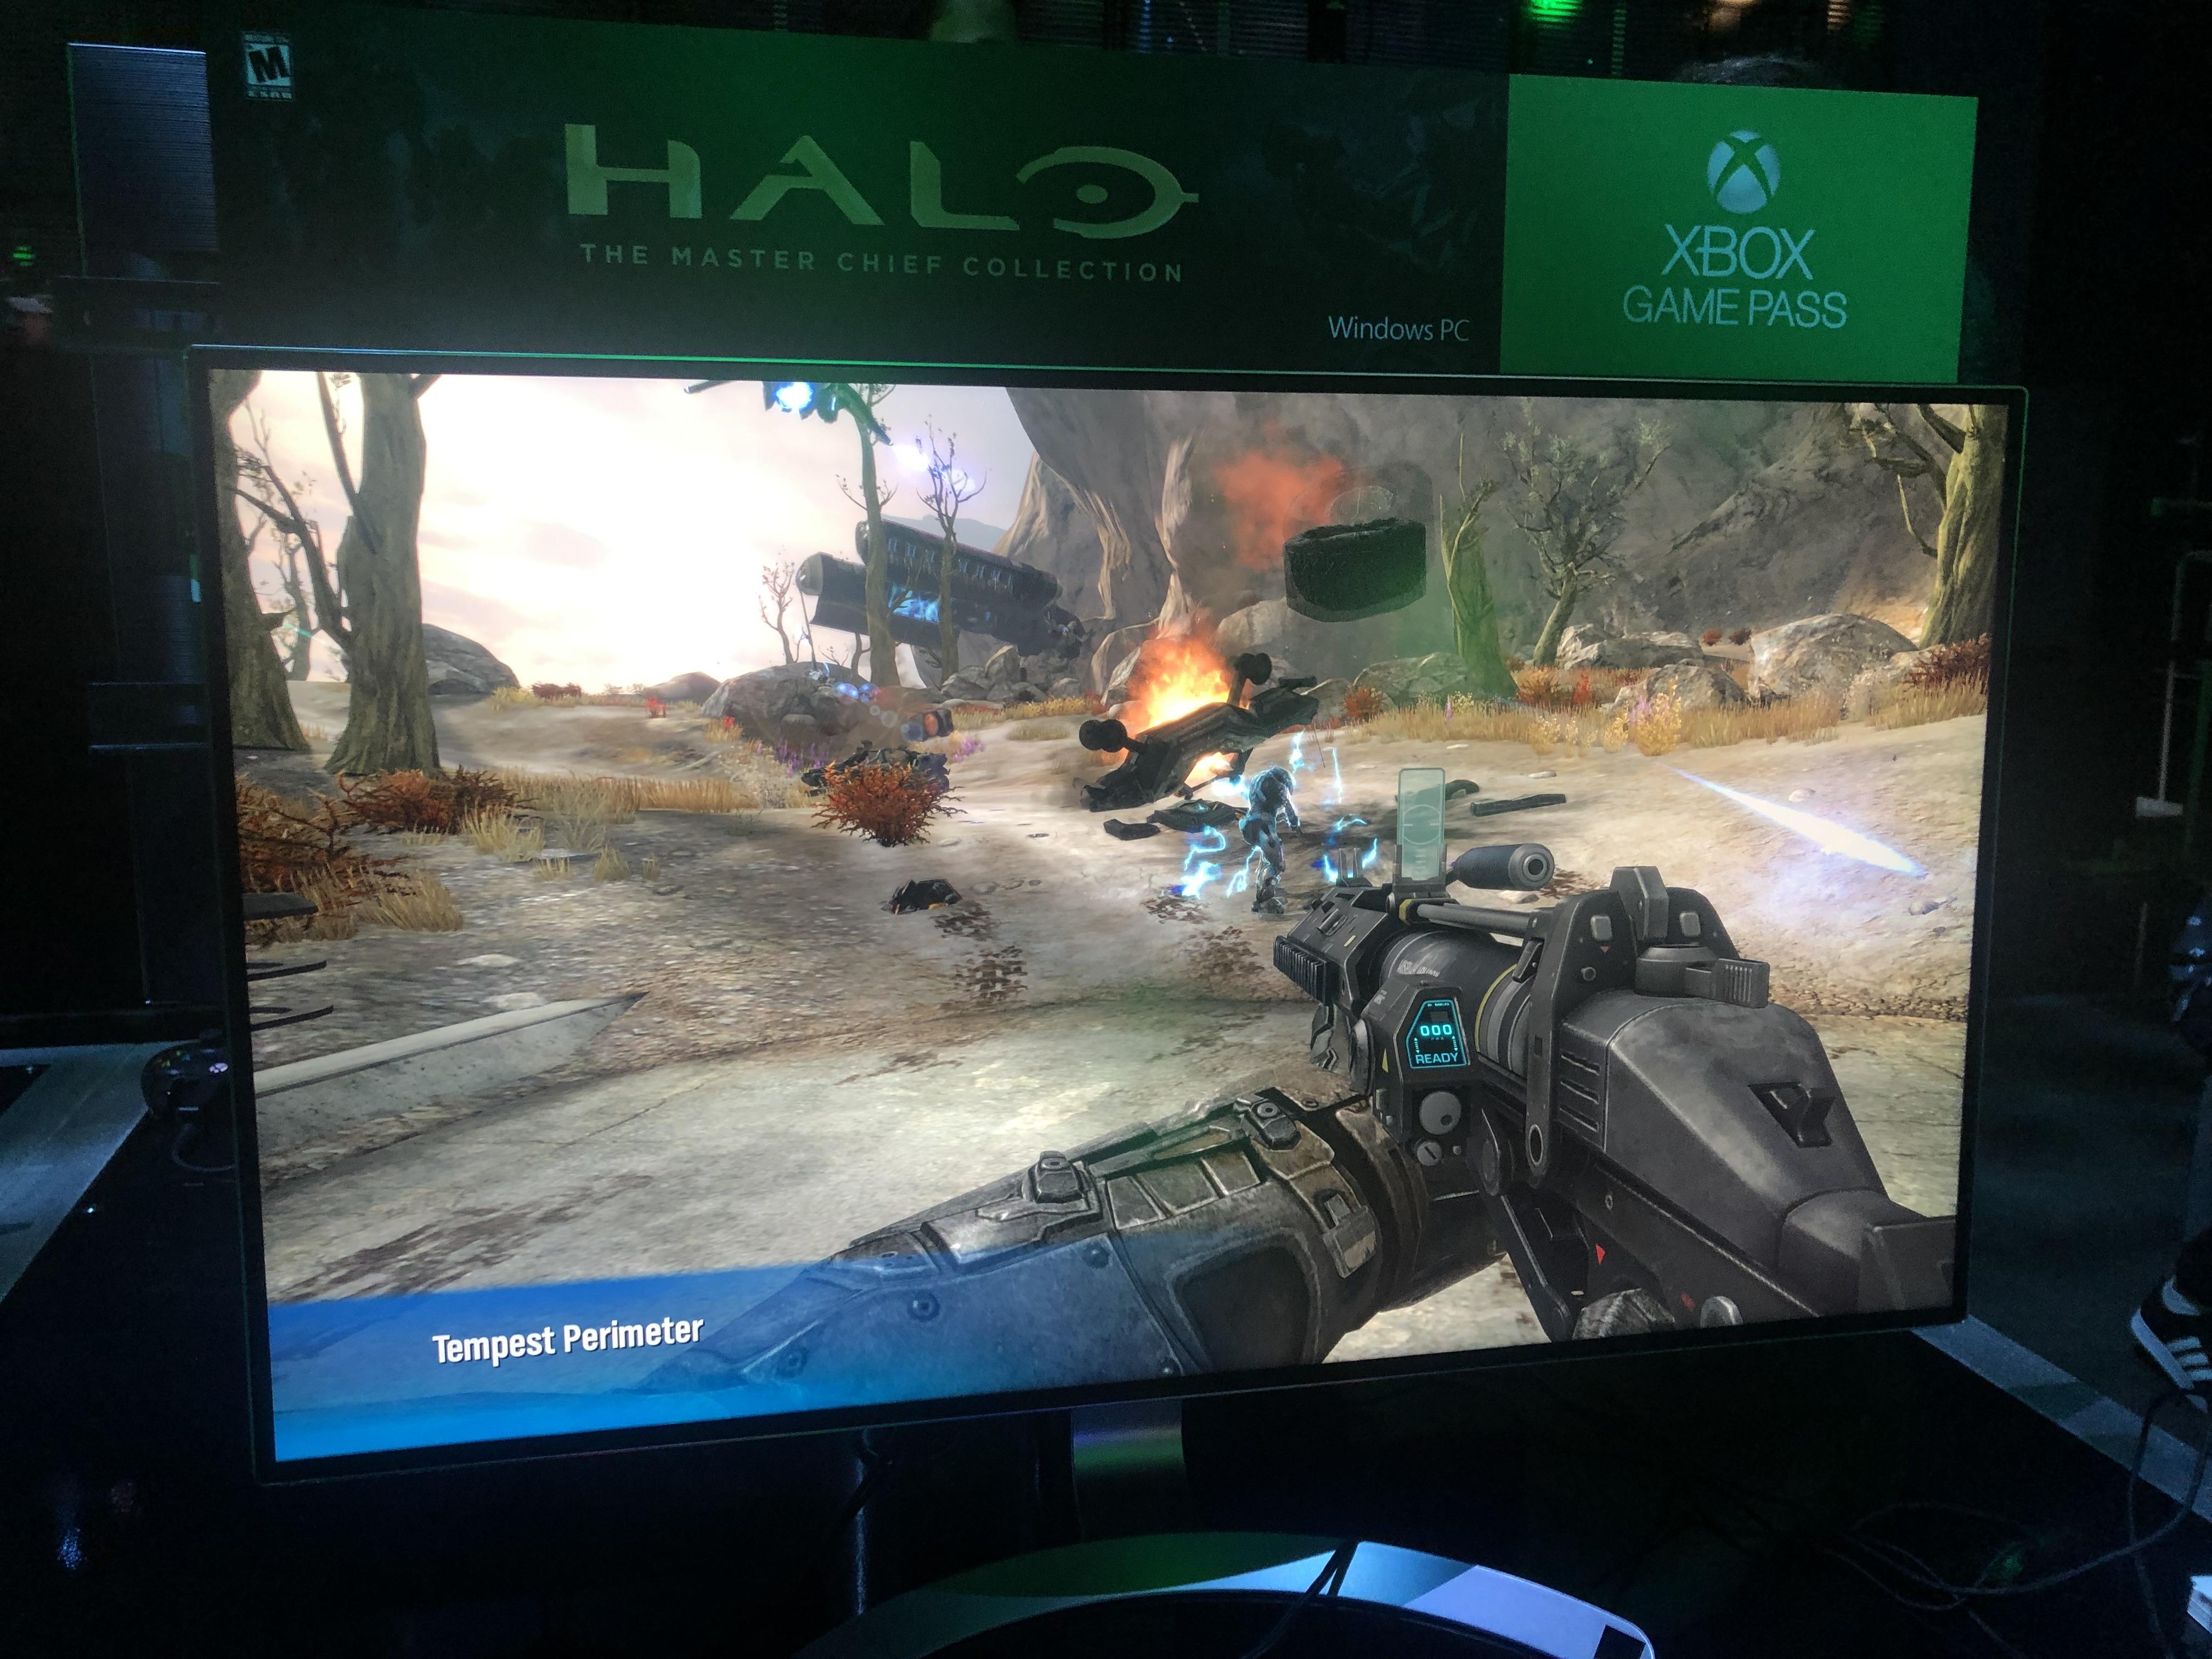 Good news, Halo Reach feels like a PC game should | PC Gamer